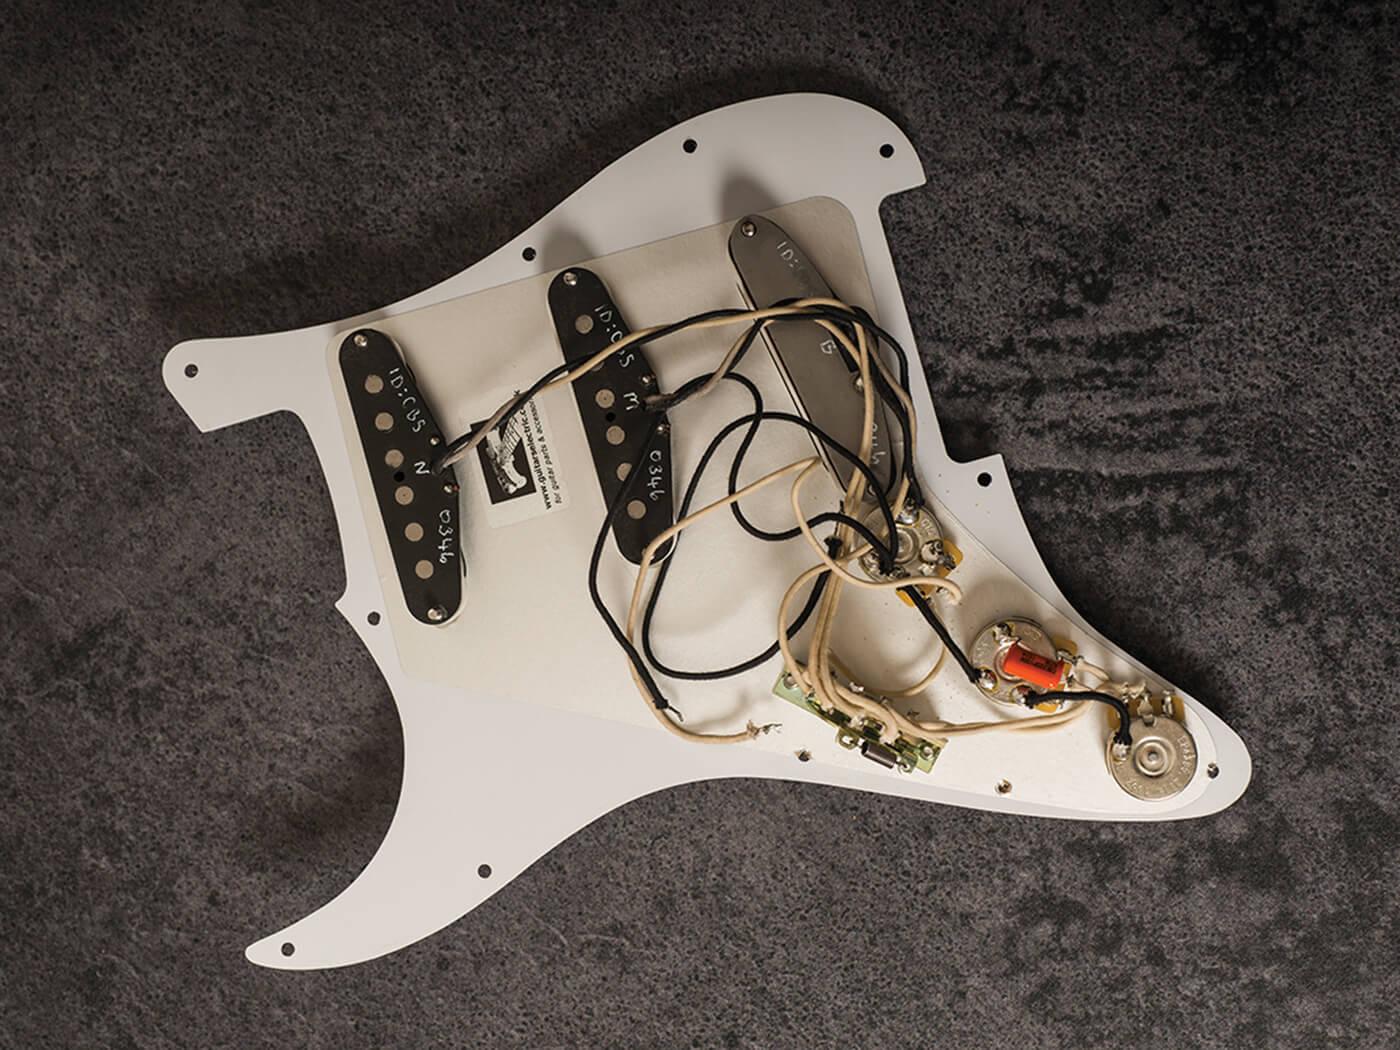 radioshop chris buck stratocaster pickups